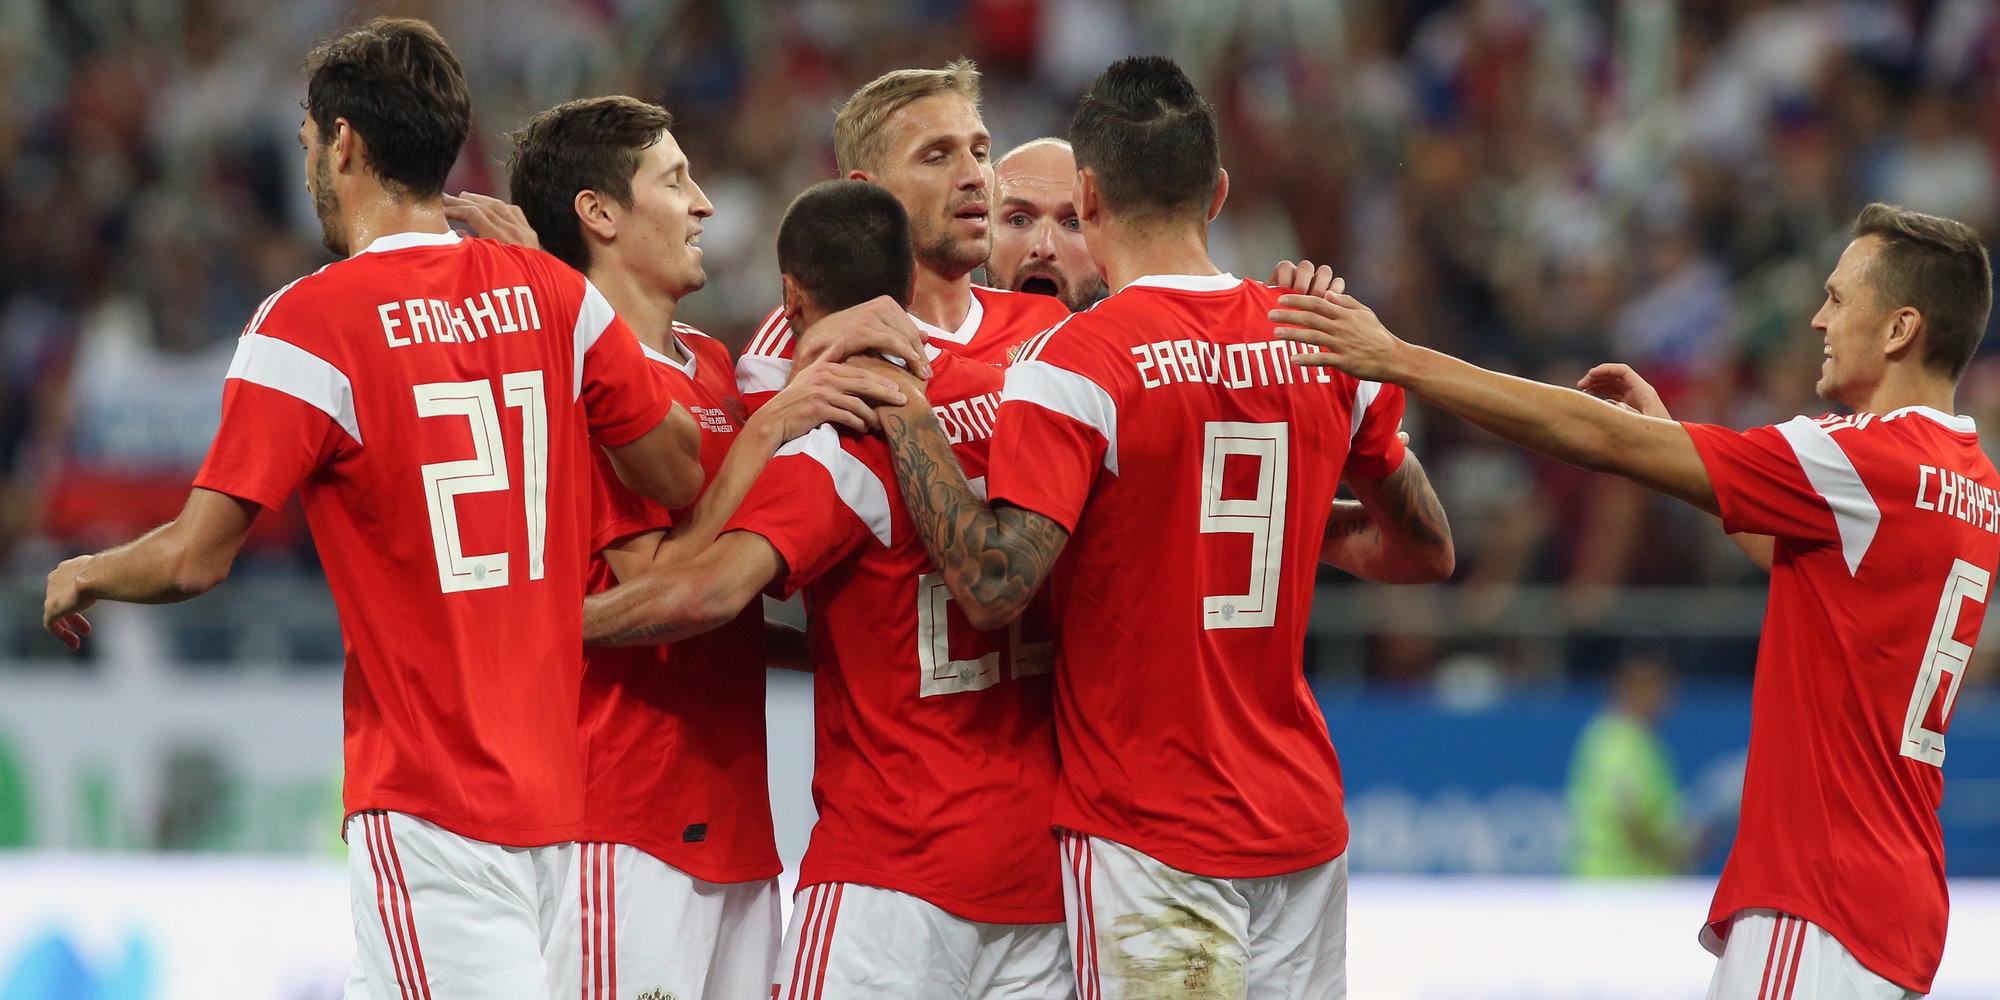 Чемпионат Чехии по футболу 2019 года